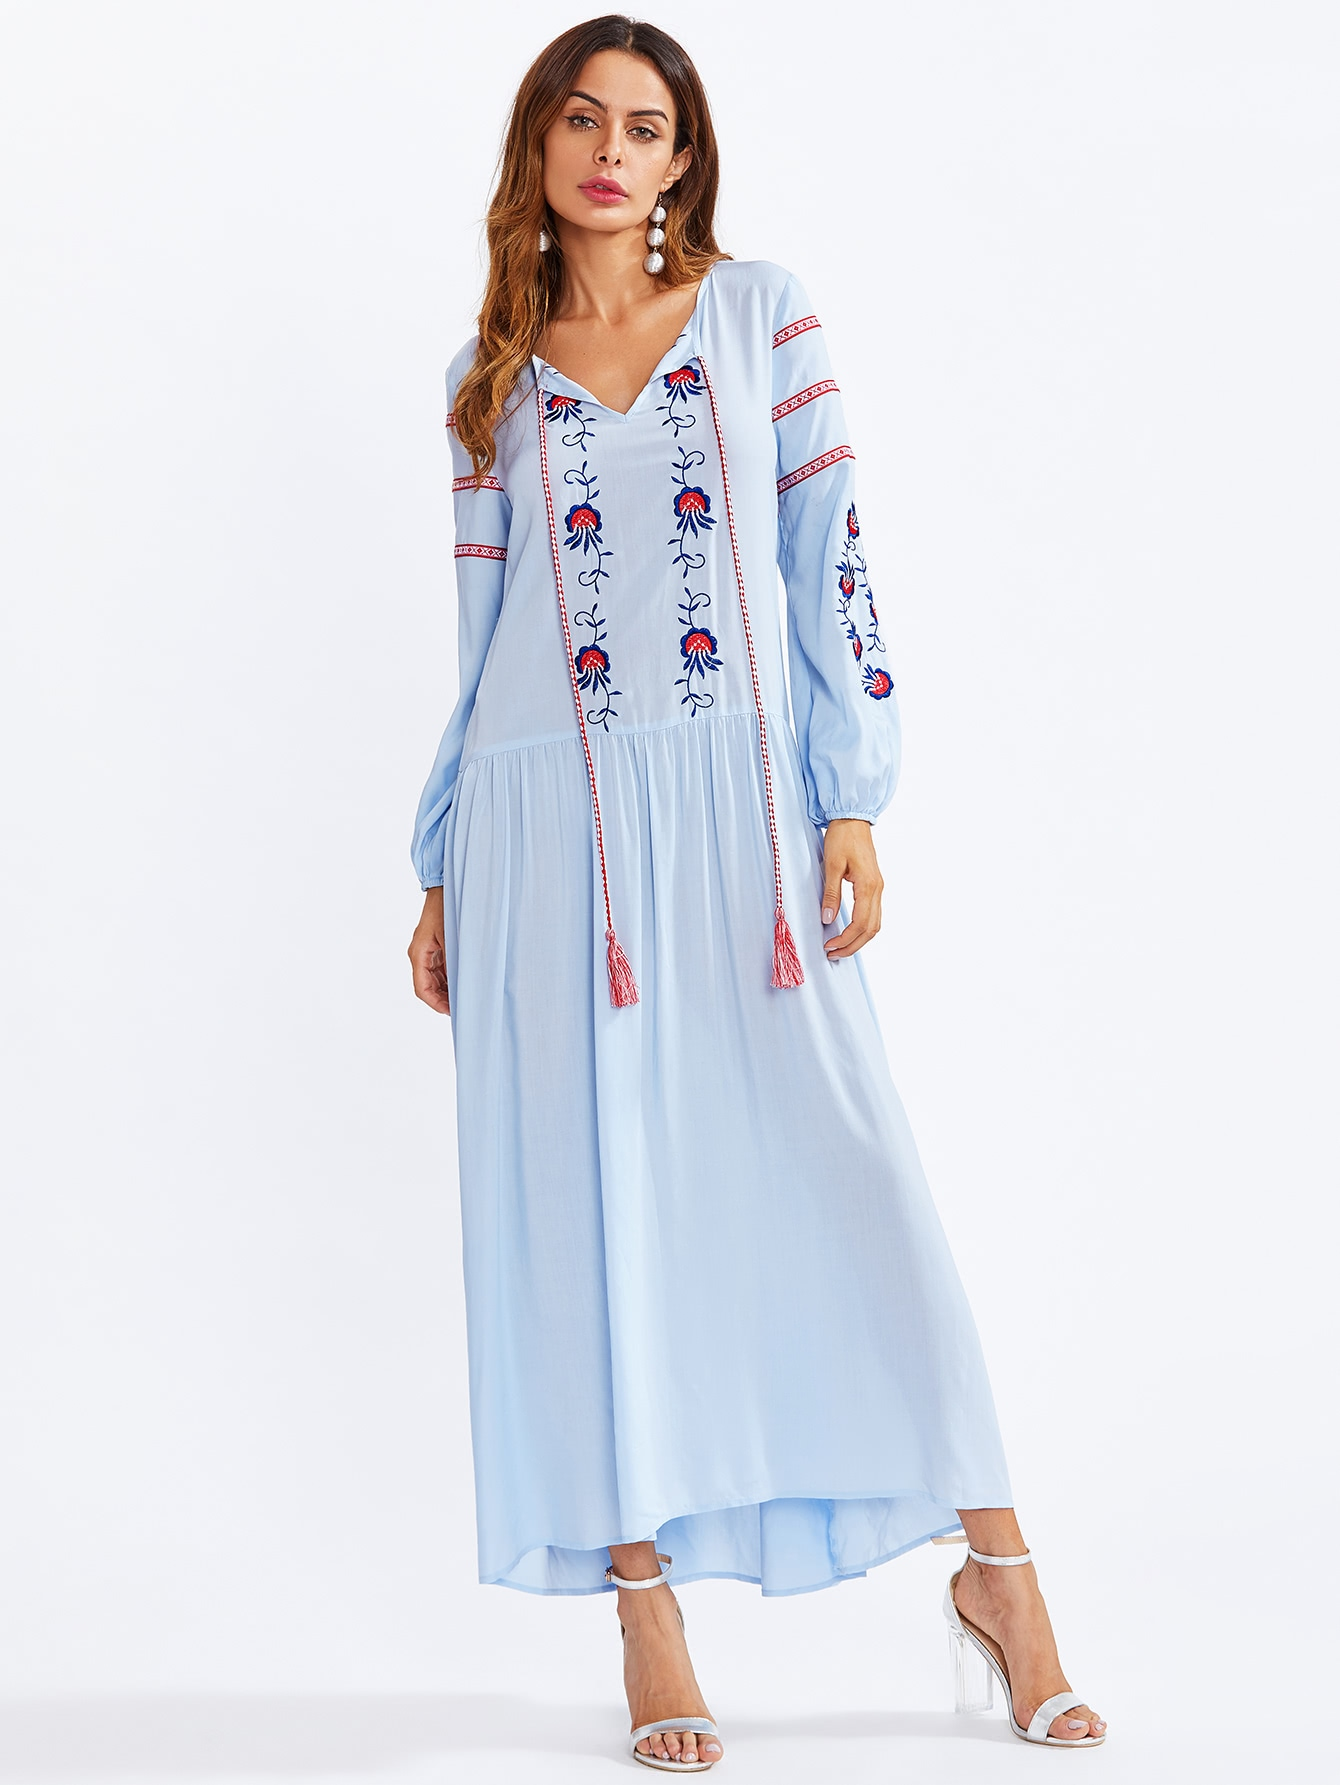 Tasseled Tie Neck Embroidered Smock Dress цена 2017